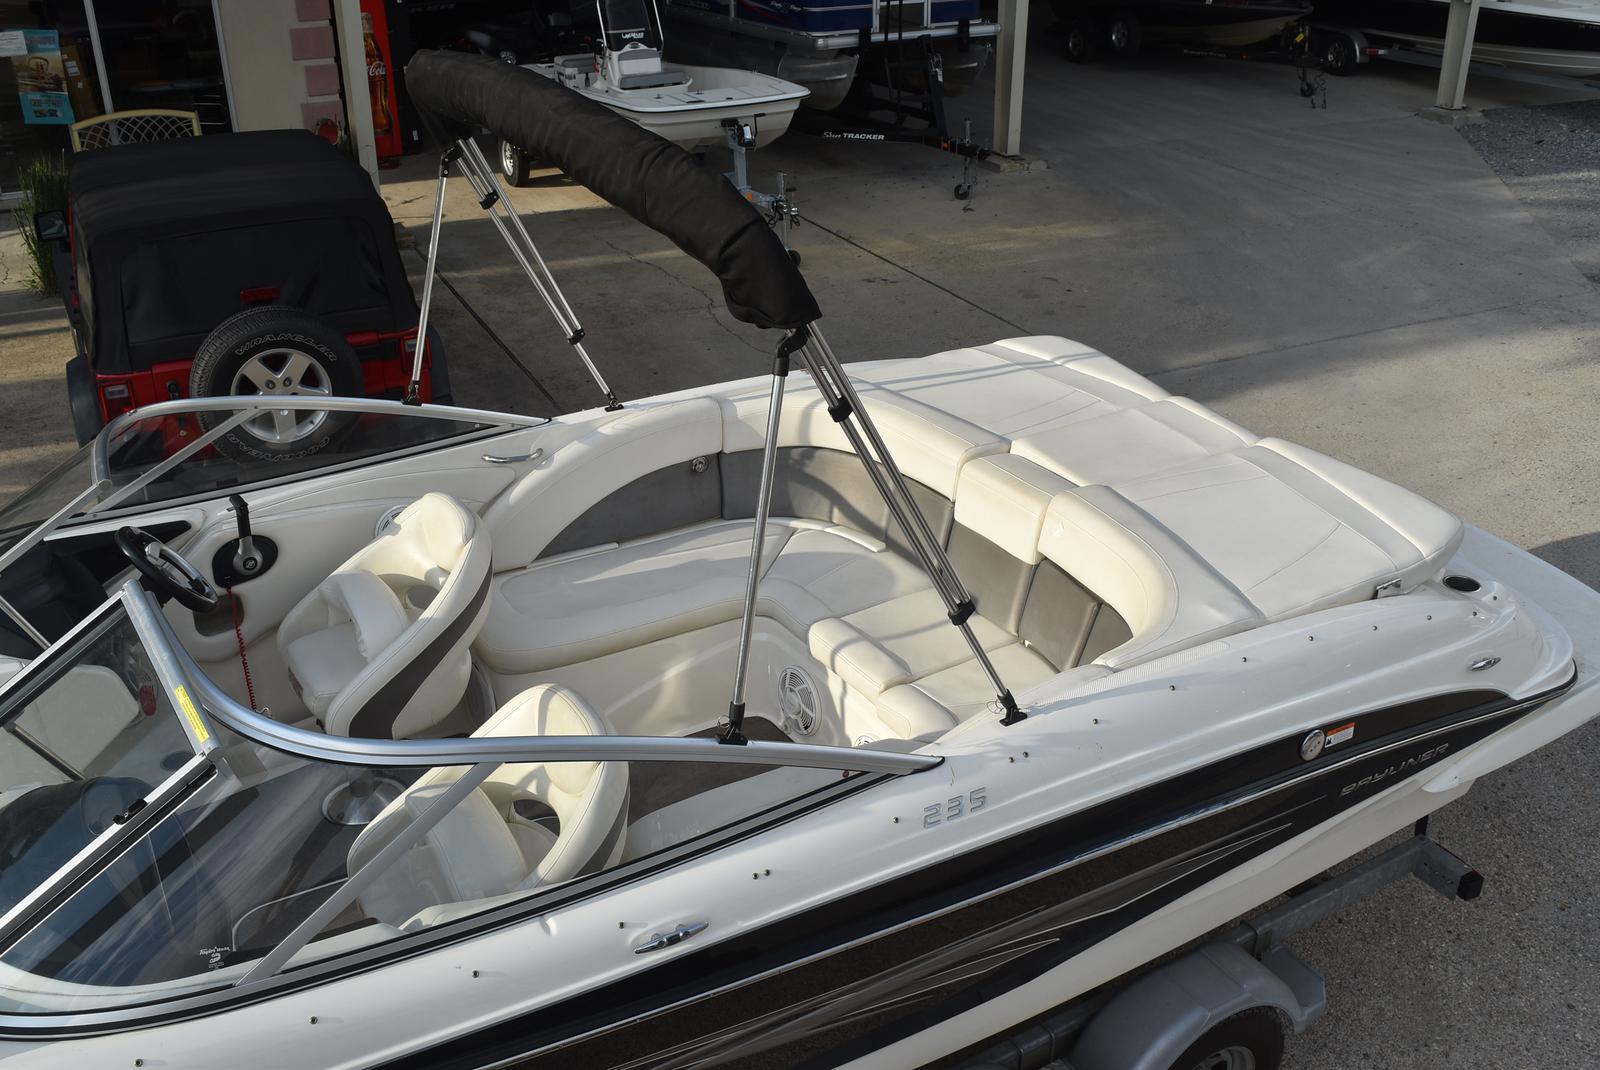 2010 Bayliner boat for sale, model of the boat is 235BR & Image # 23 of 43